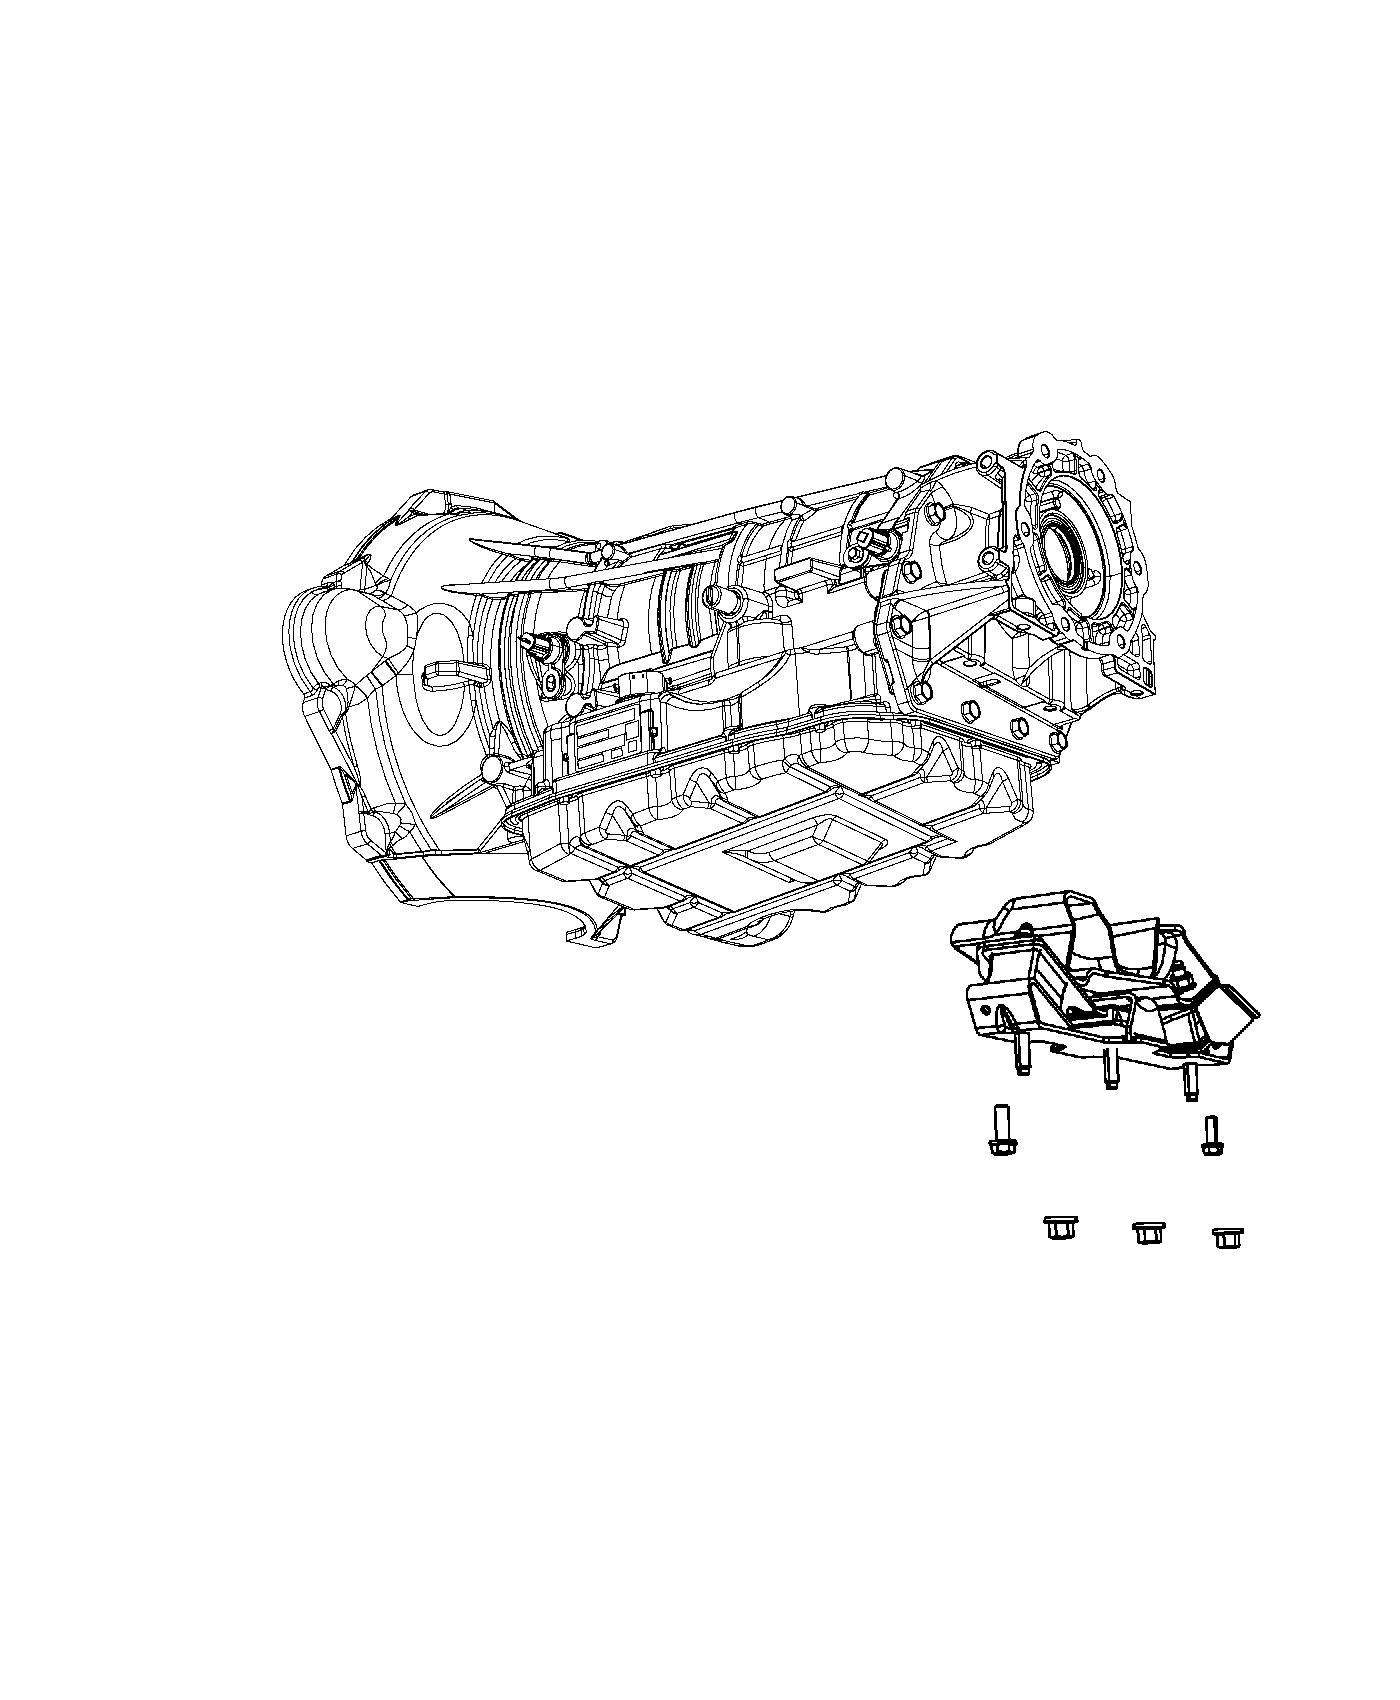 Ram Isolator Transmission Mount 3 73 Rear Axle